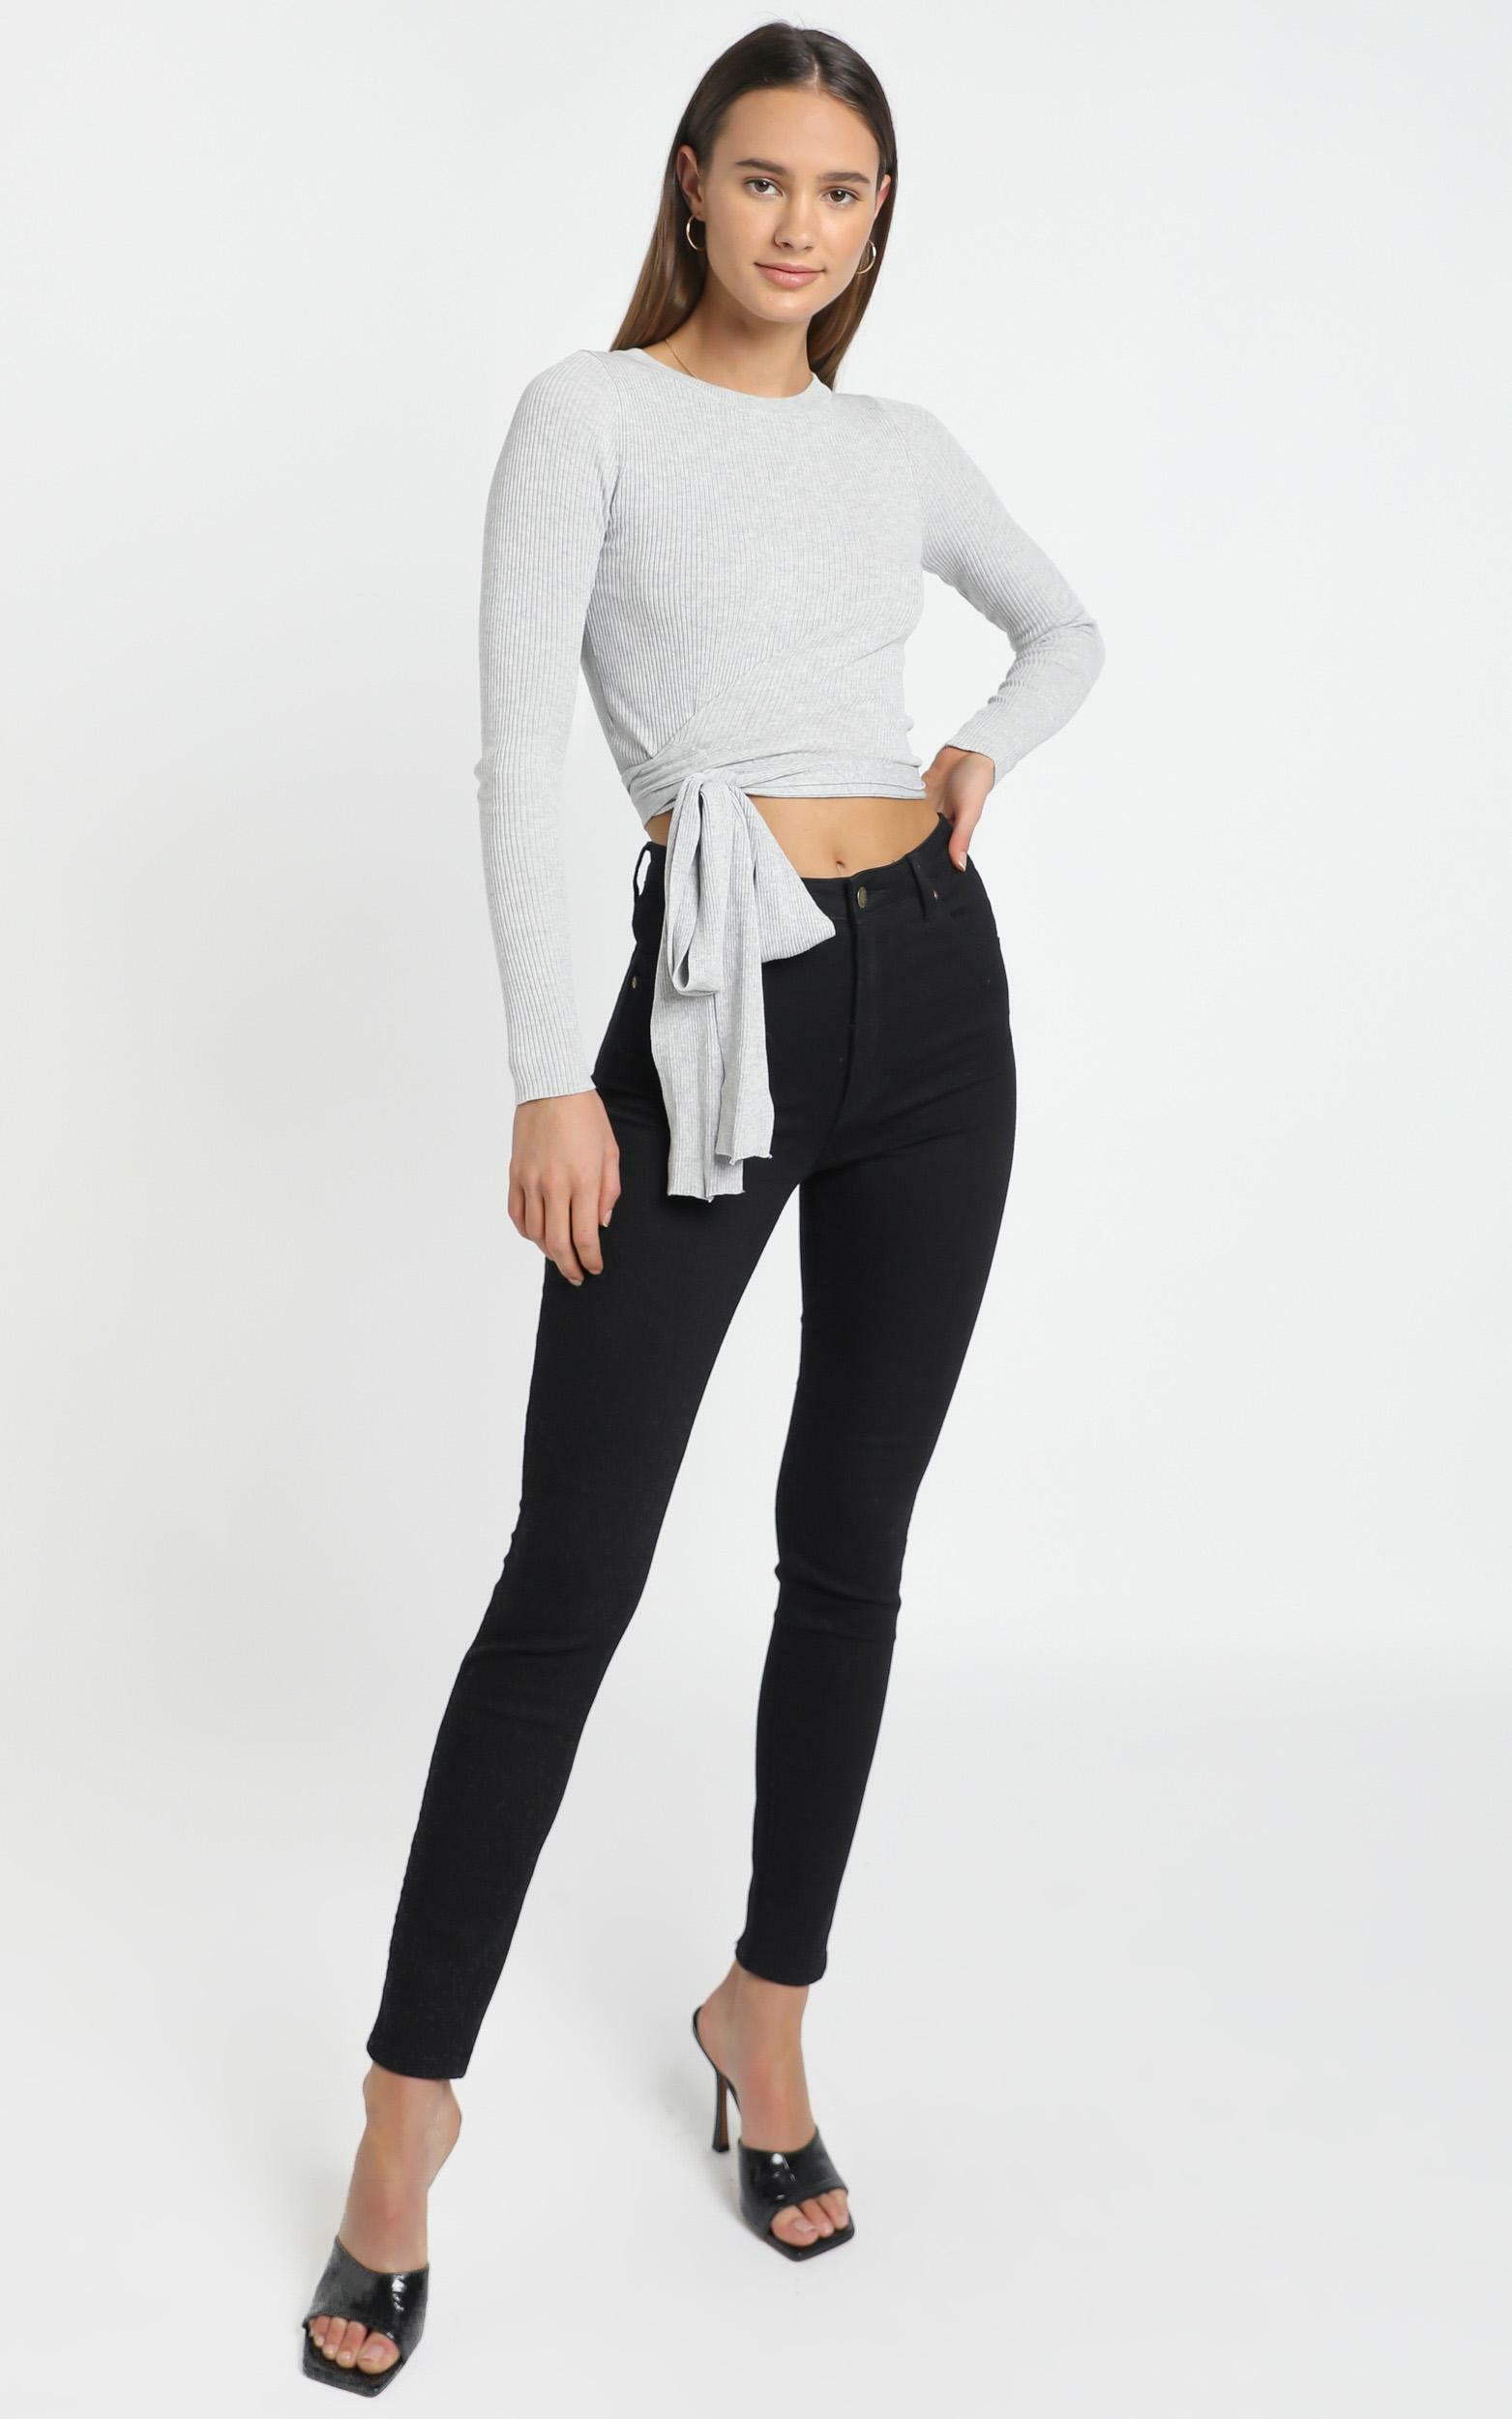 Malik Knit Top in Grey - M/L, Grey, hi-res image number null